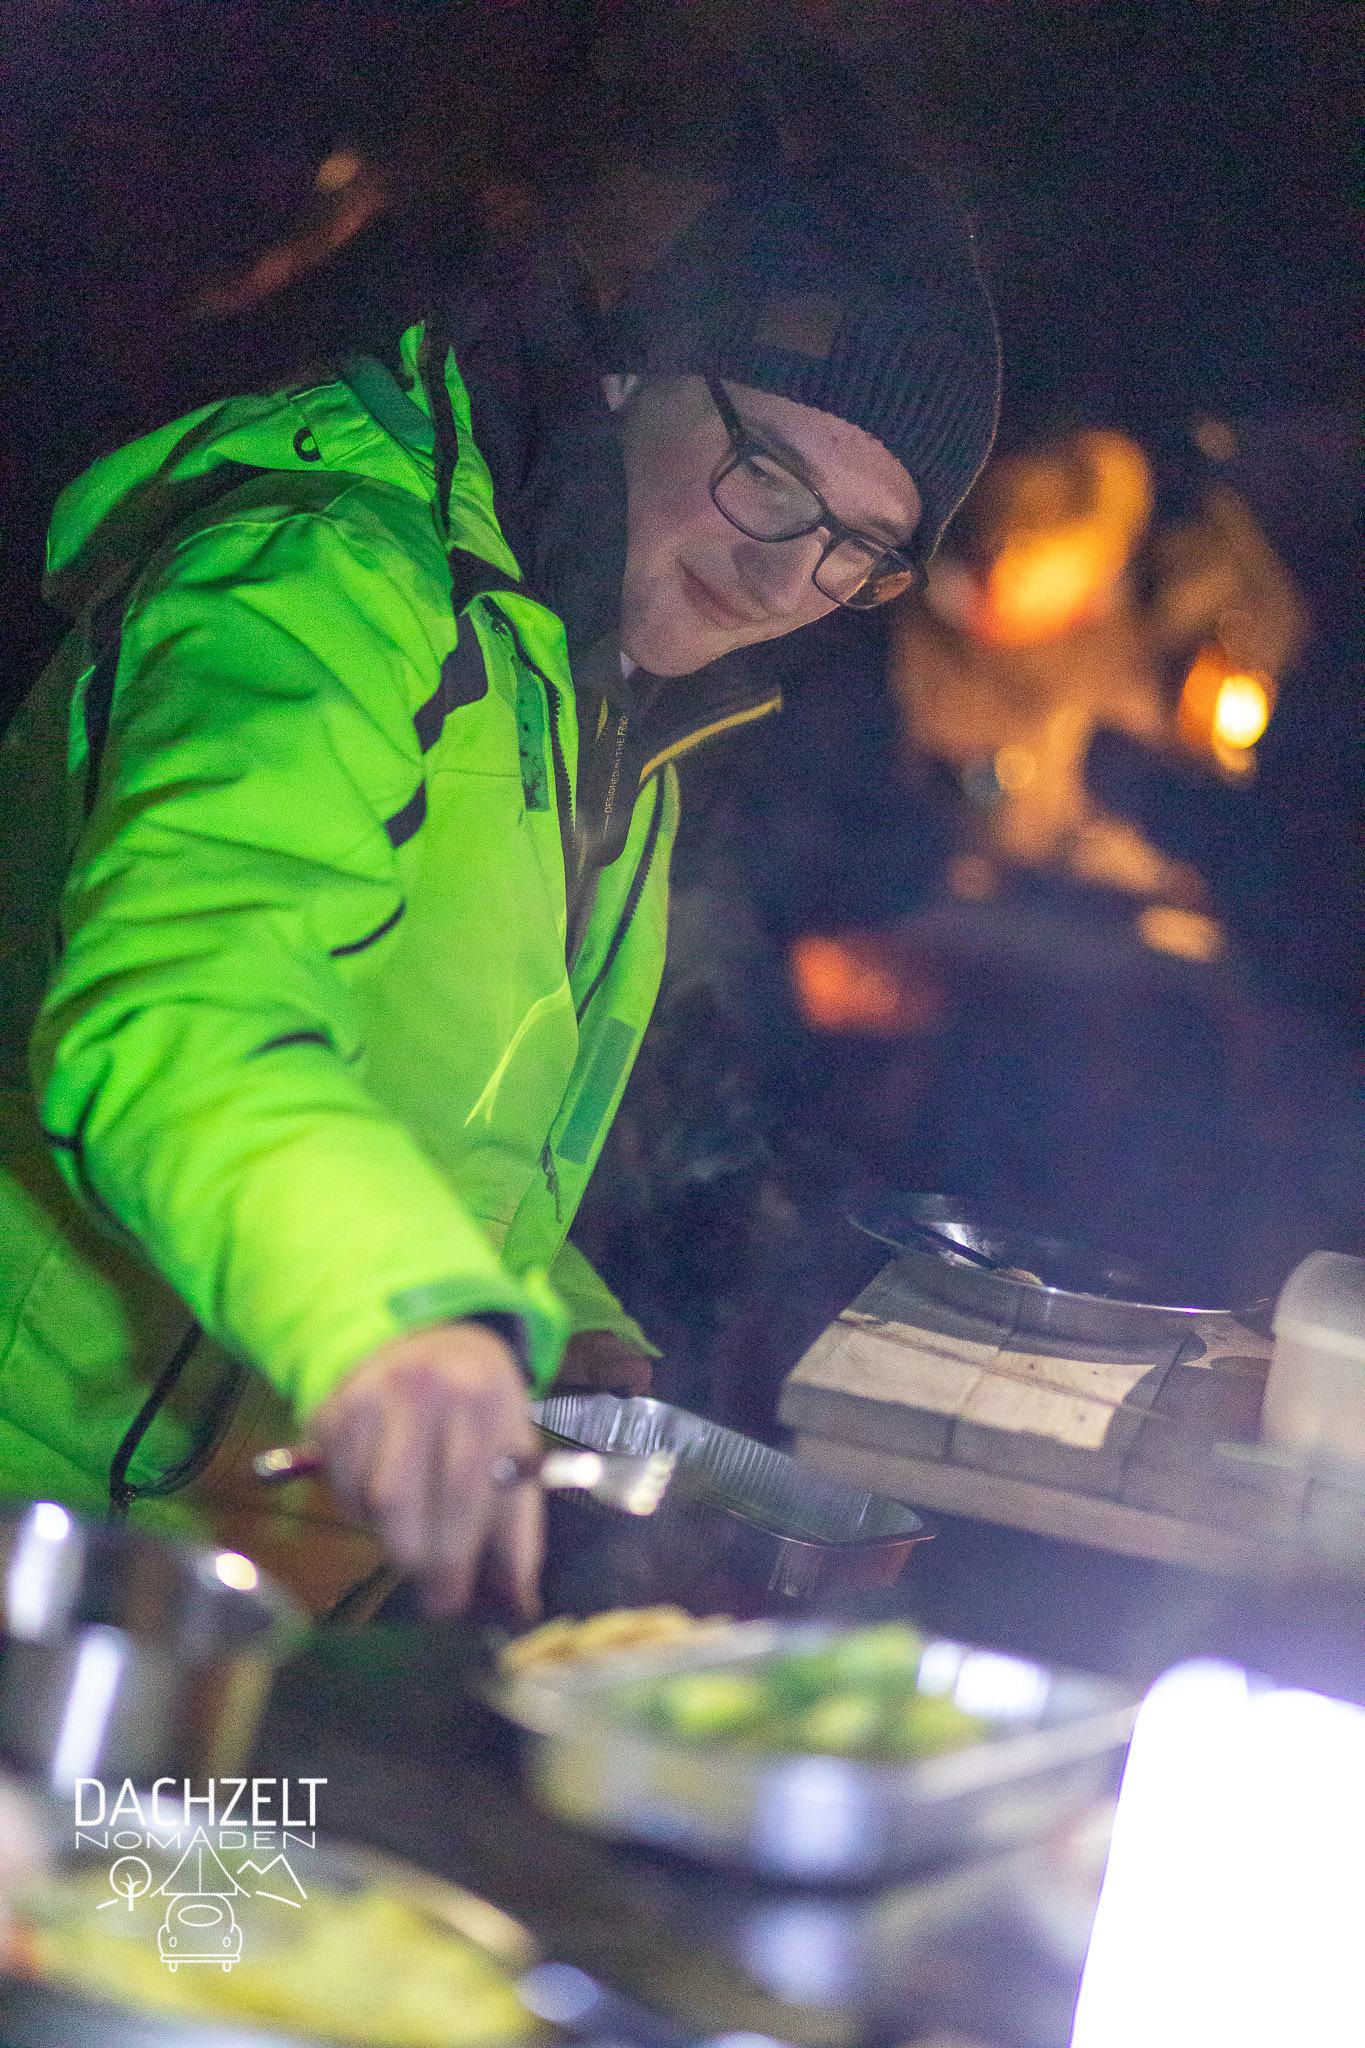 20191231-DACHZELT-SILVESTER-CAMP-Dennis-Brandt- DB 5110-Raclette